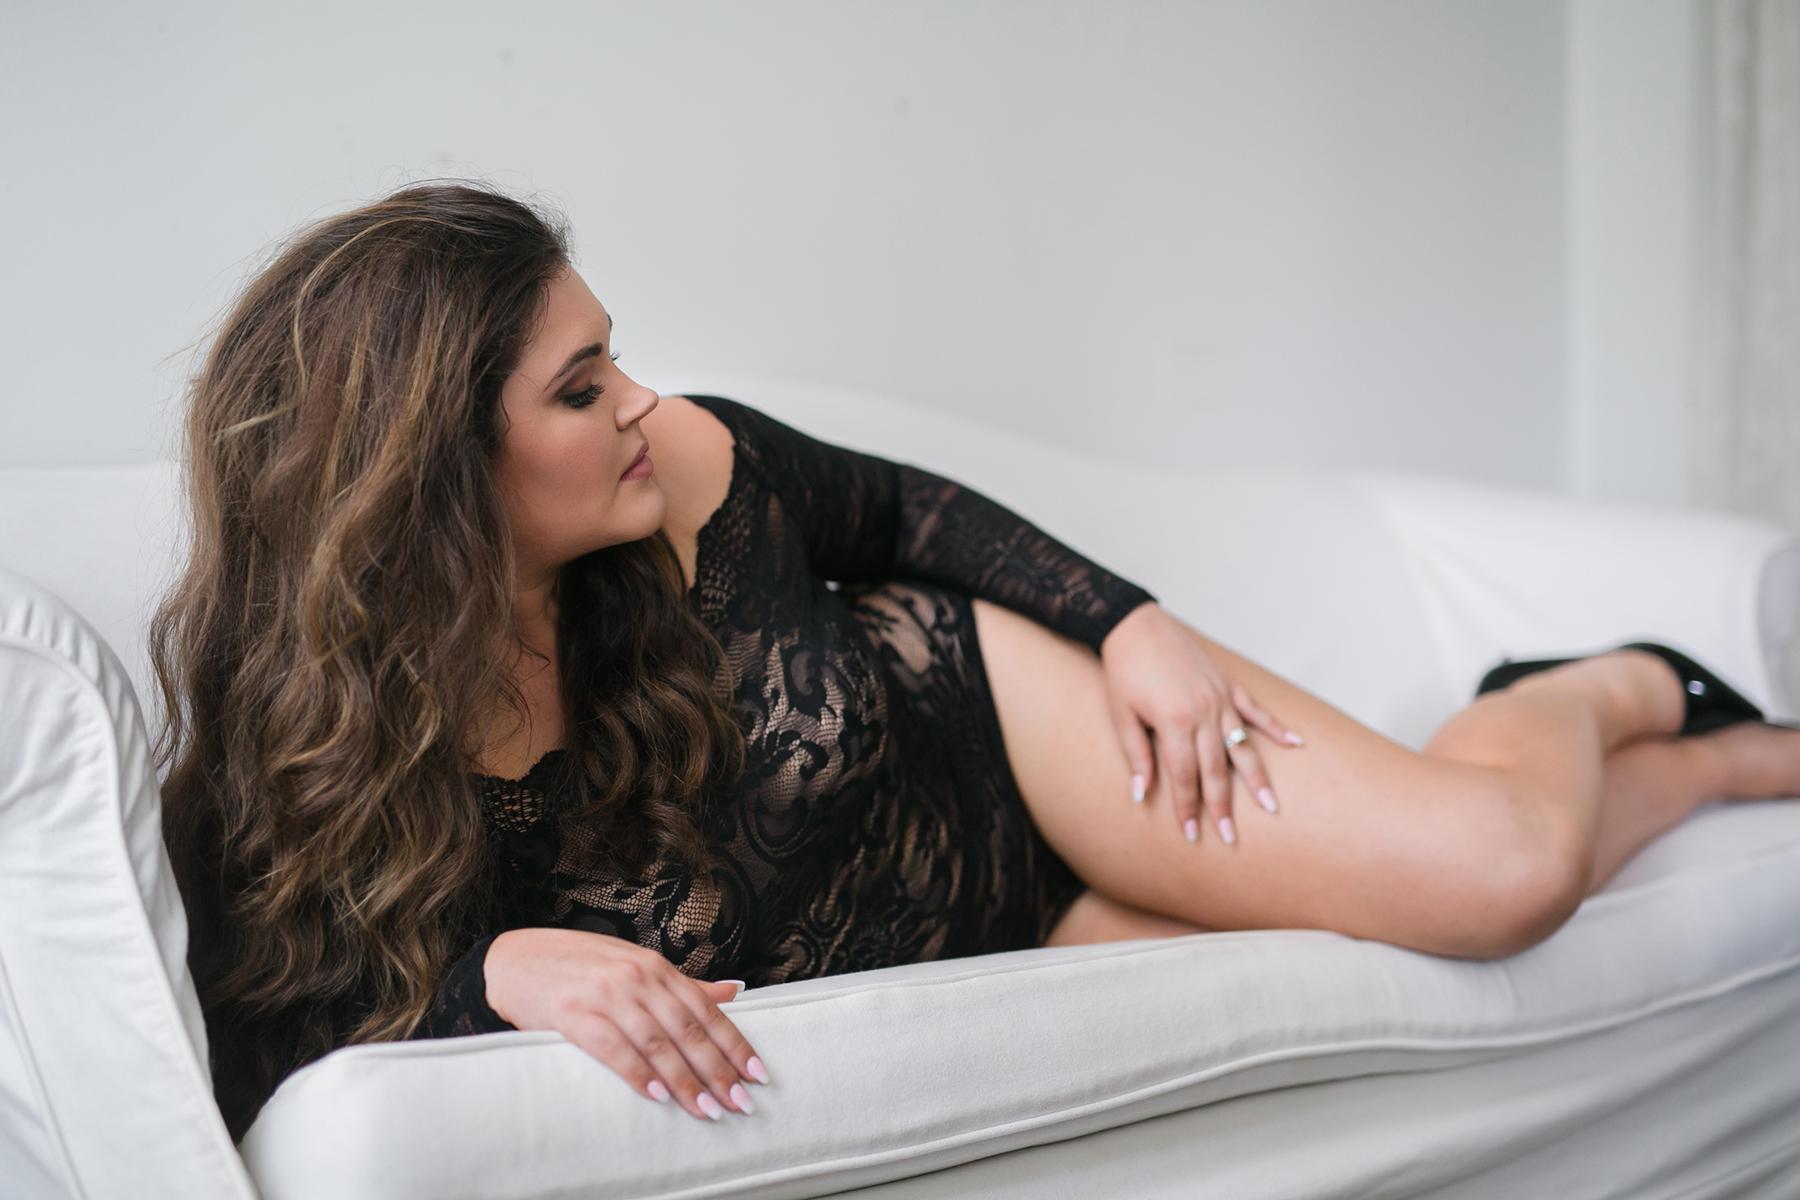 austin-tx-boudoir-photographer-photography-kimberly-brooke-11.jpg